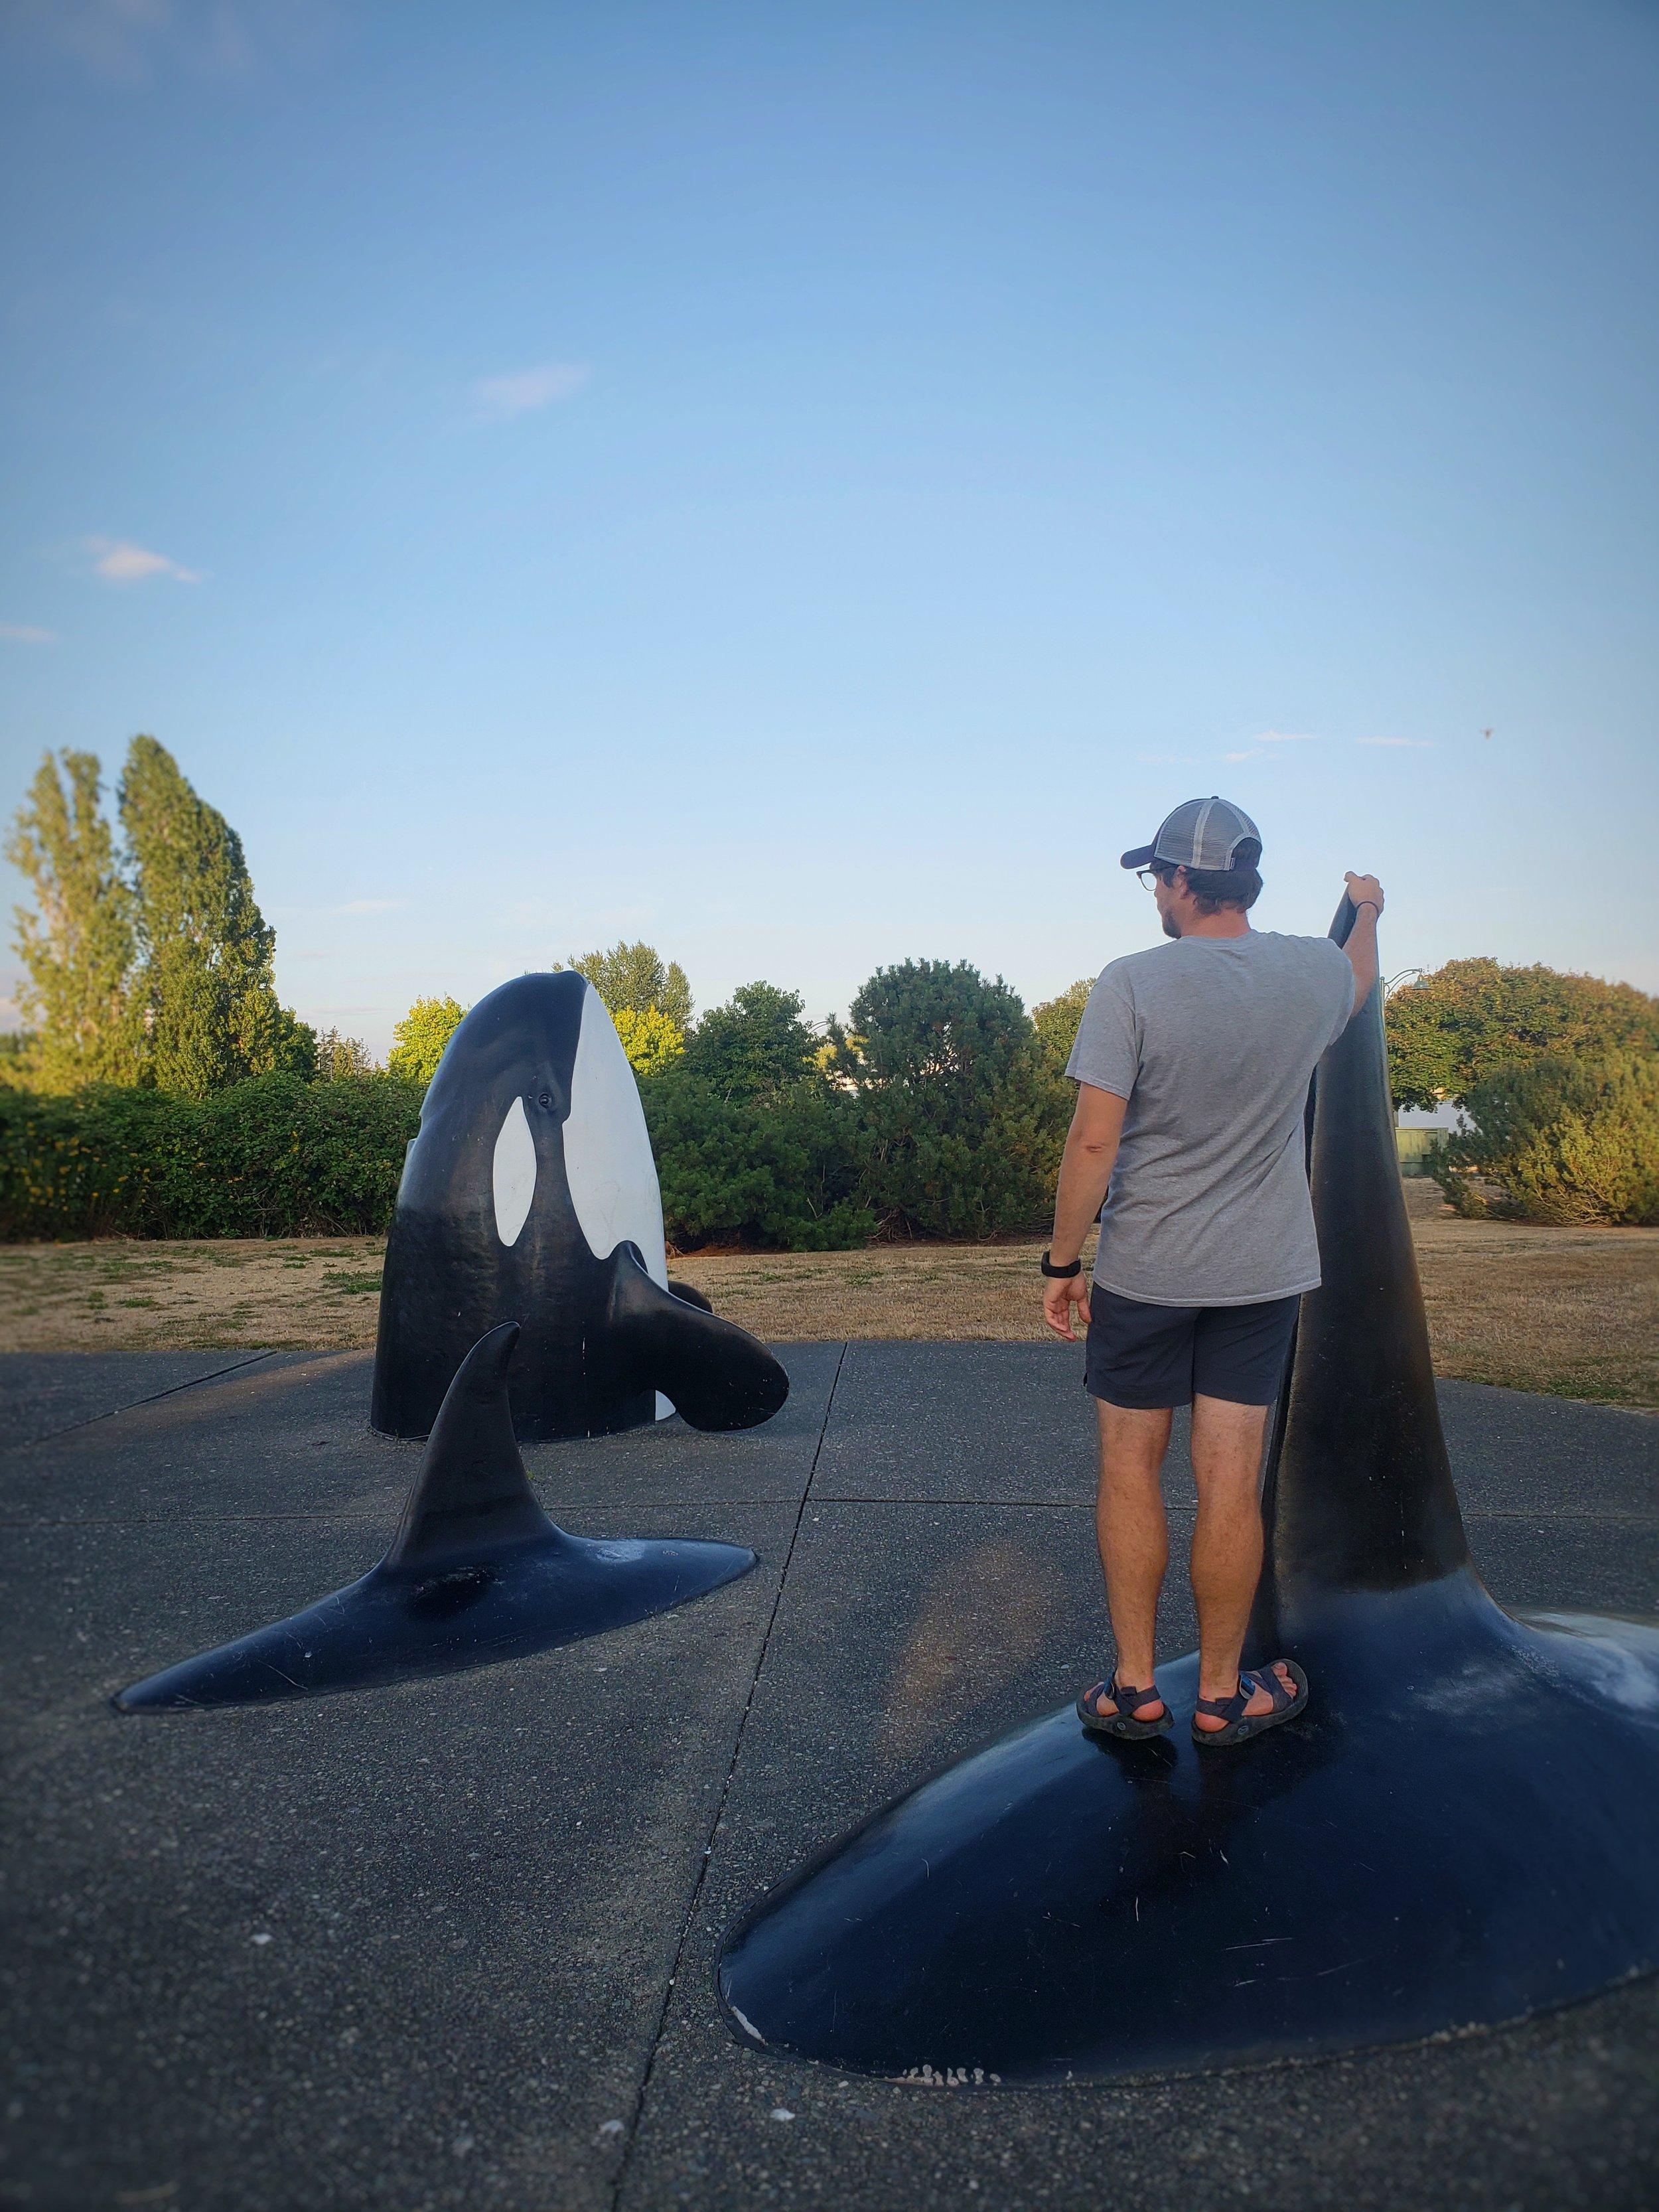 Orca sculptures in Blaine Marine Park.